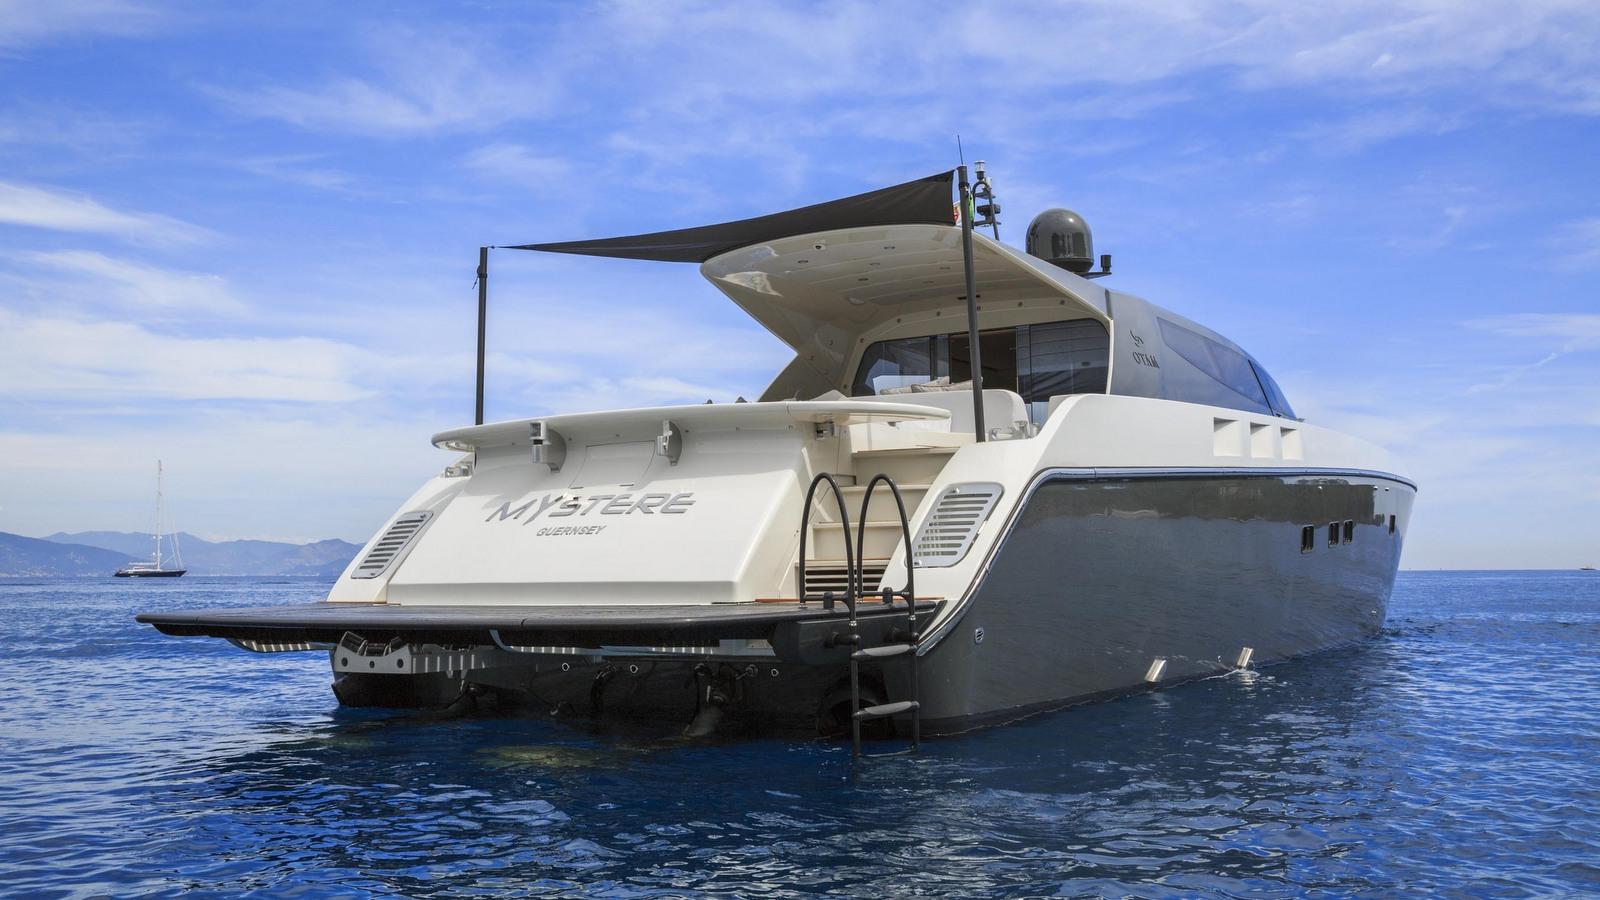 aft-view-of-the-otam-millennium-80ht-yacht-mystere